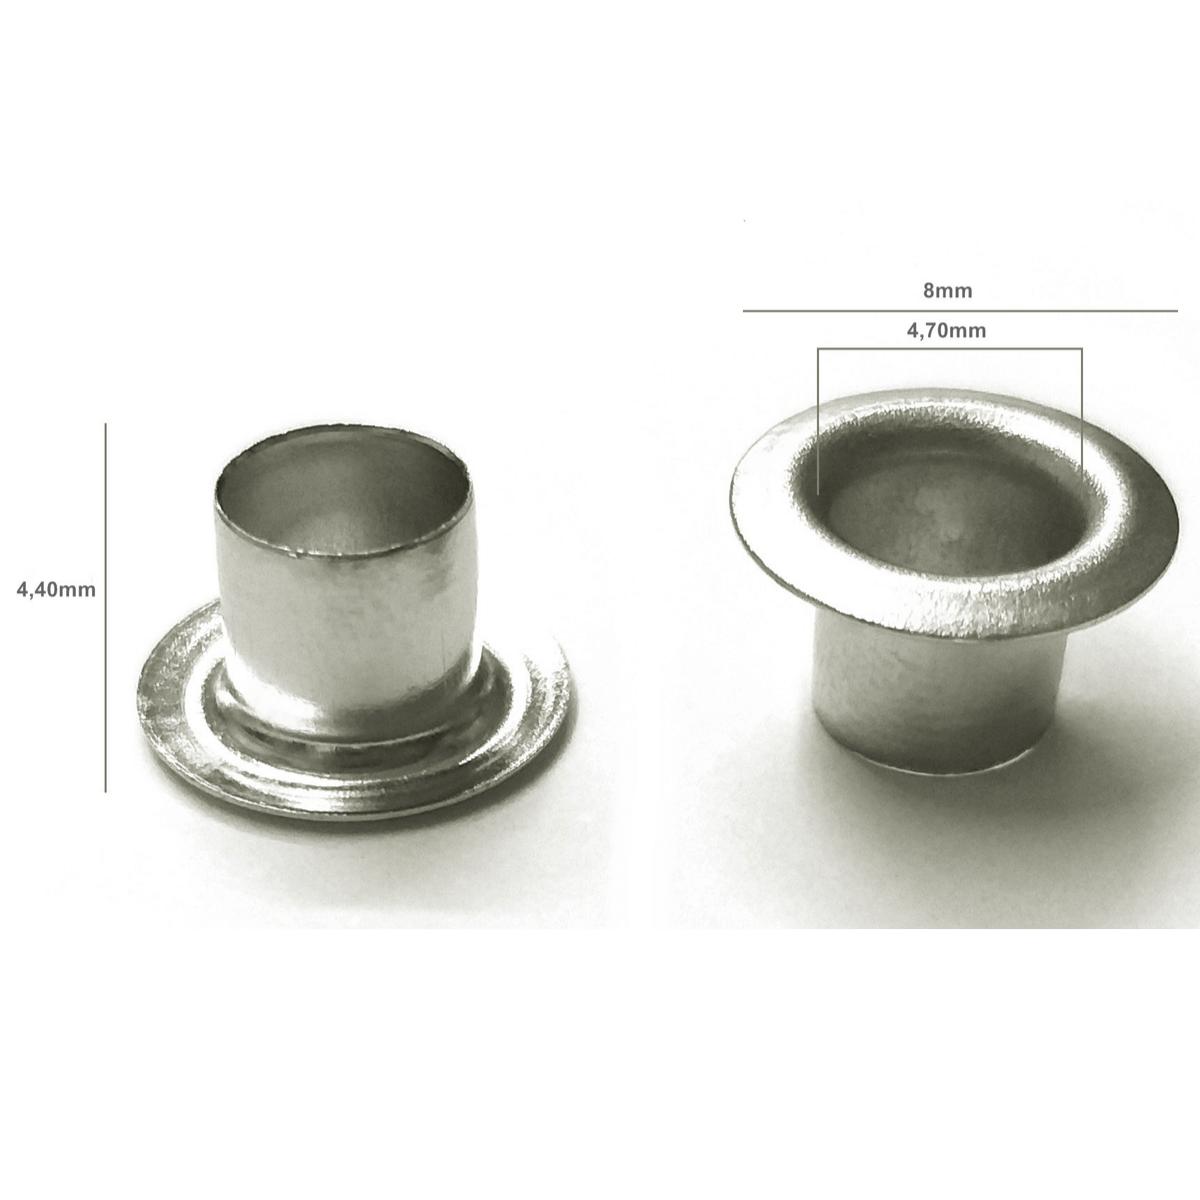 Ilhós Alumínio Preto Nº 54 8mm de diâmetro externo